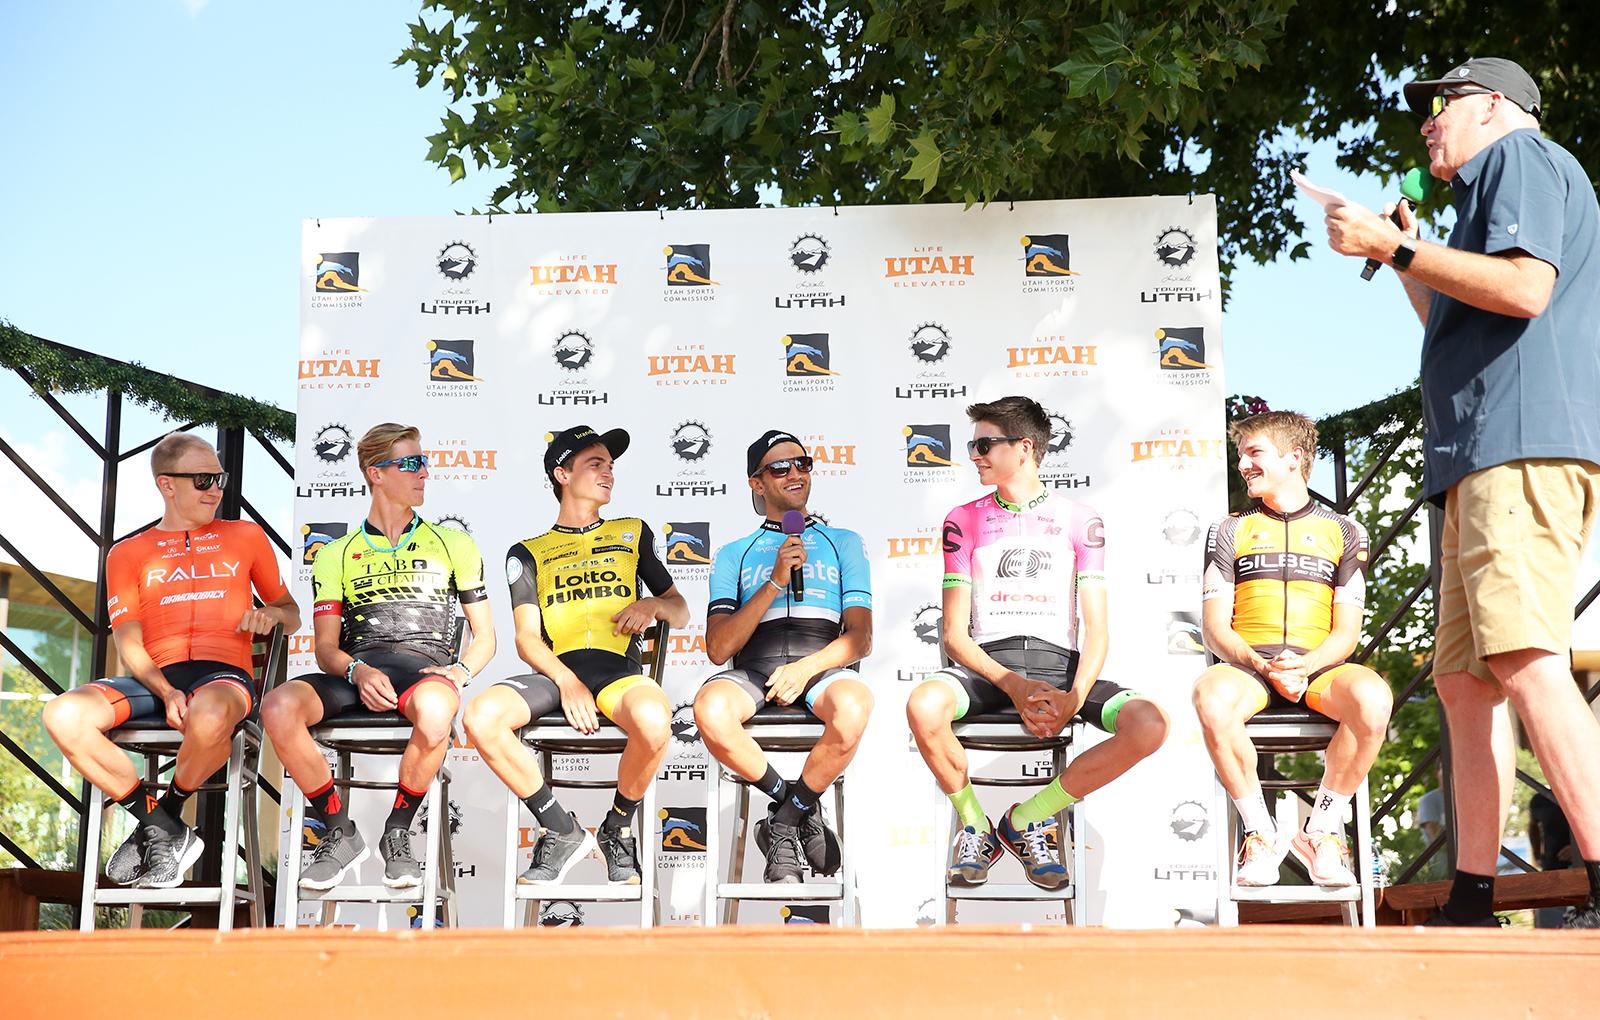 Rider interviews at the 2018 Tour of Utah Team Presentation, August 4, 2018, Cedar City, Utah. Photo by Cathy Fegan-Kim, cottonsoxphotography.net